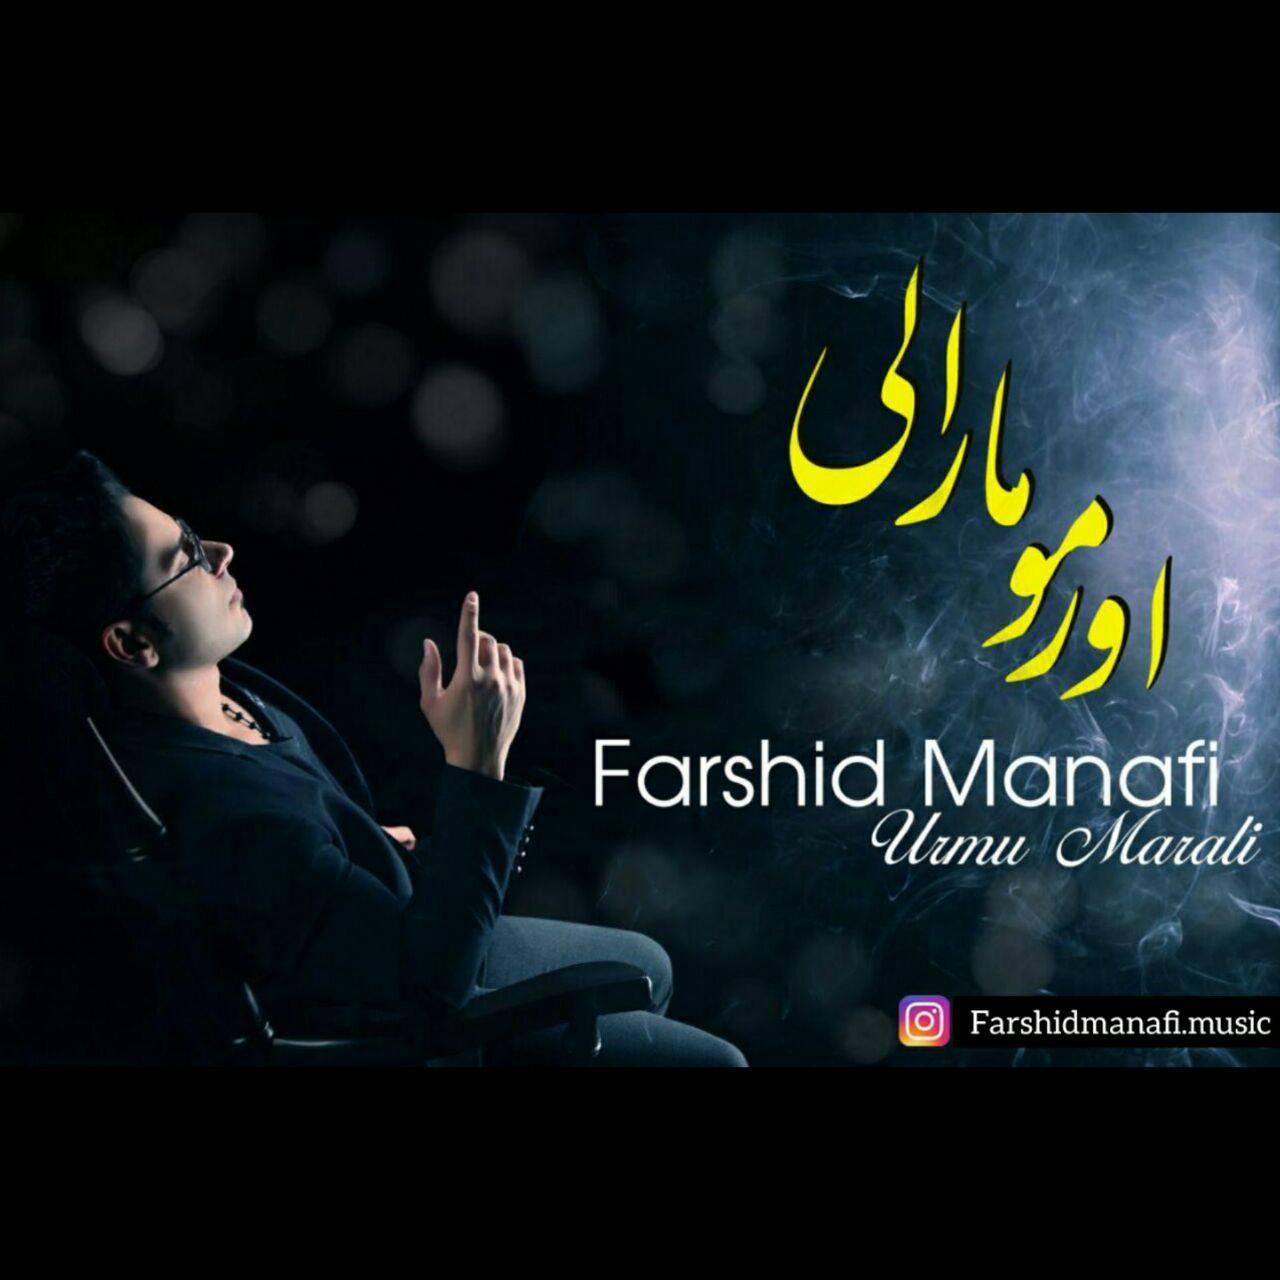 Farshid Manafi – Urmu Marali